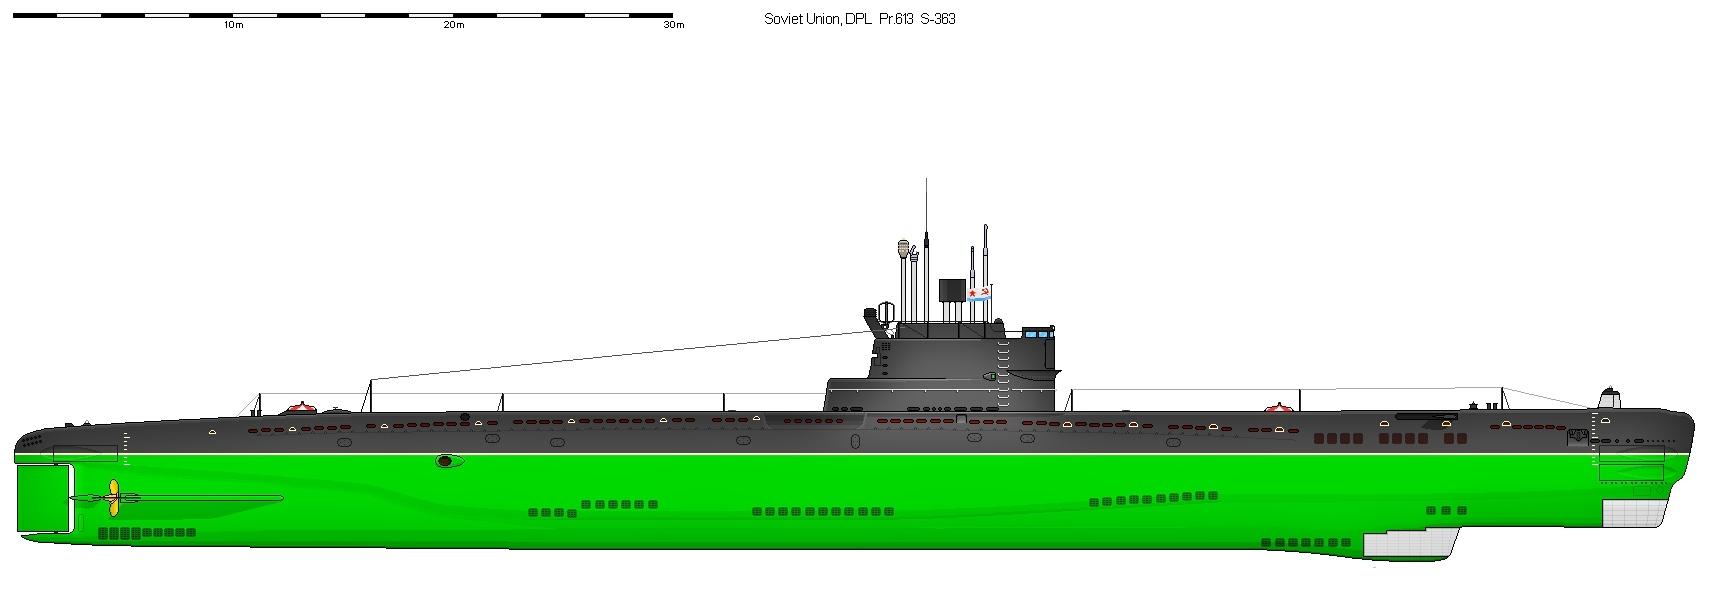 USSR Pr613 (2).jpg